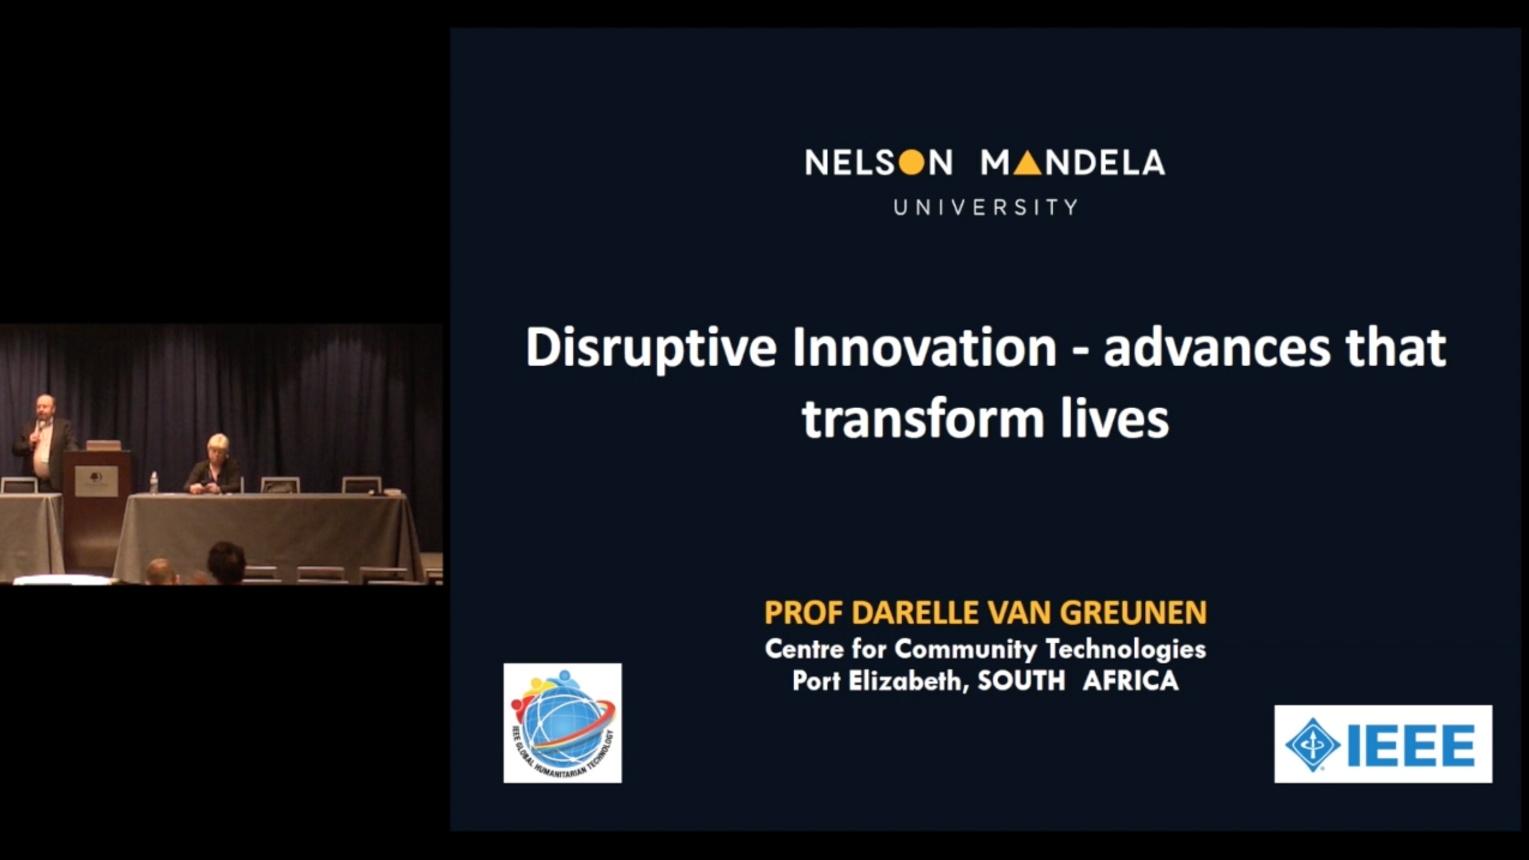 Disruptive Innovation: Advances that Transform Lives - Darelle Van Greunen keynote, GHTC 2017